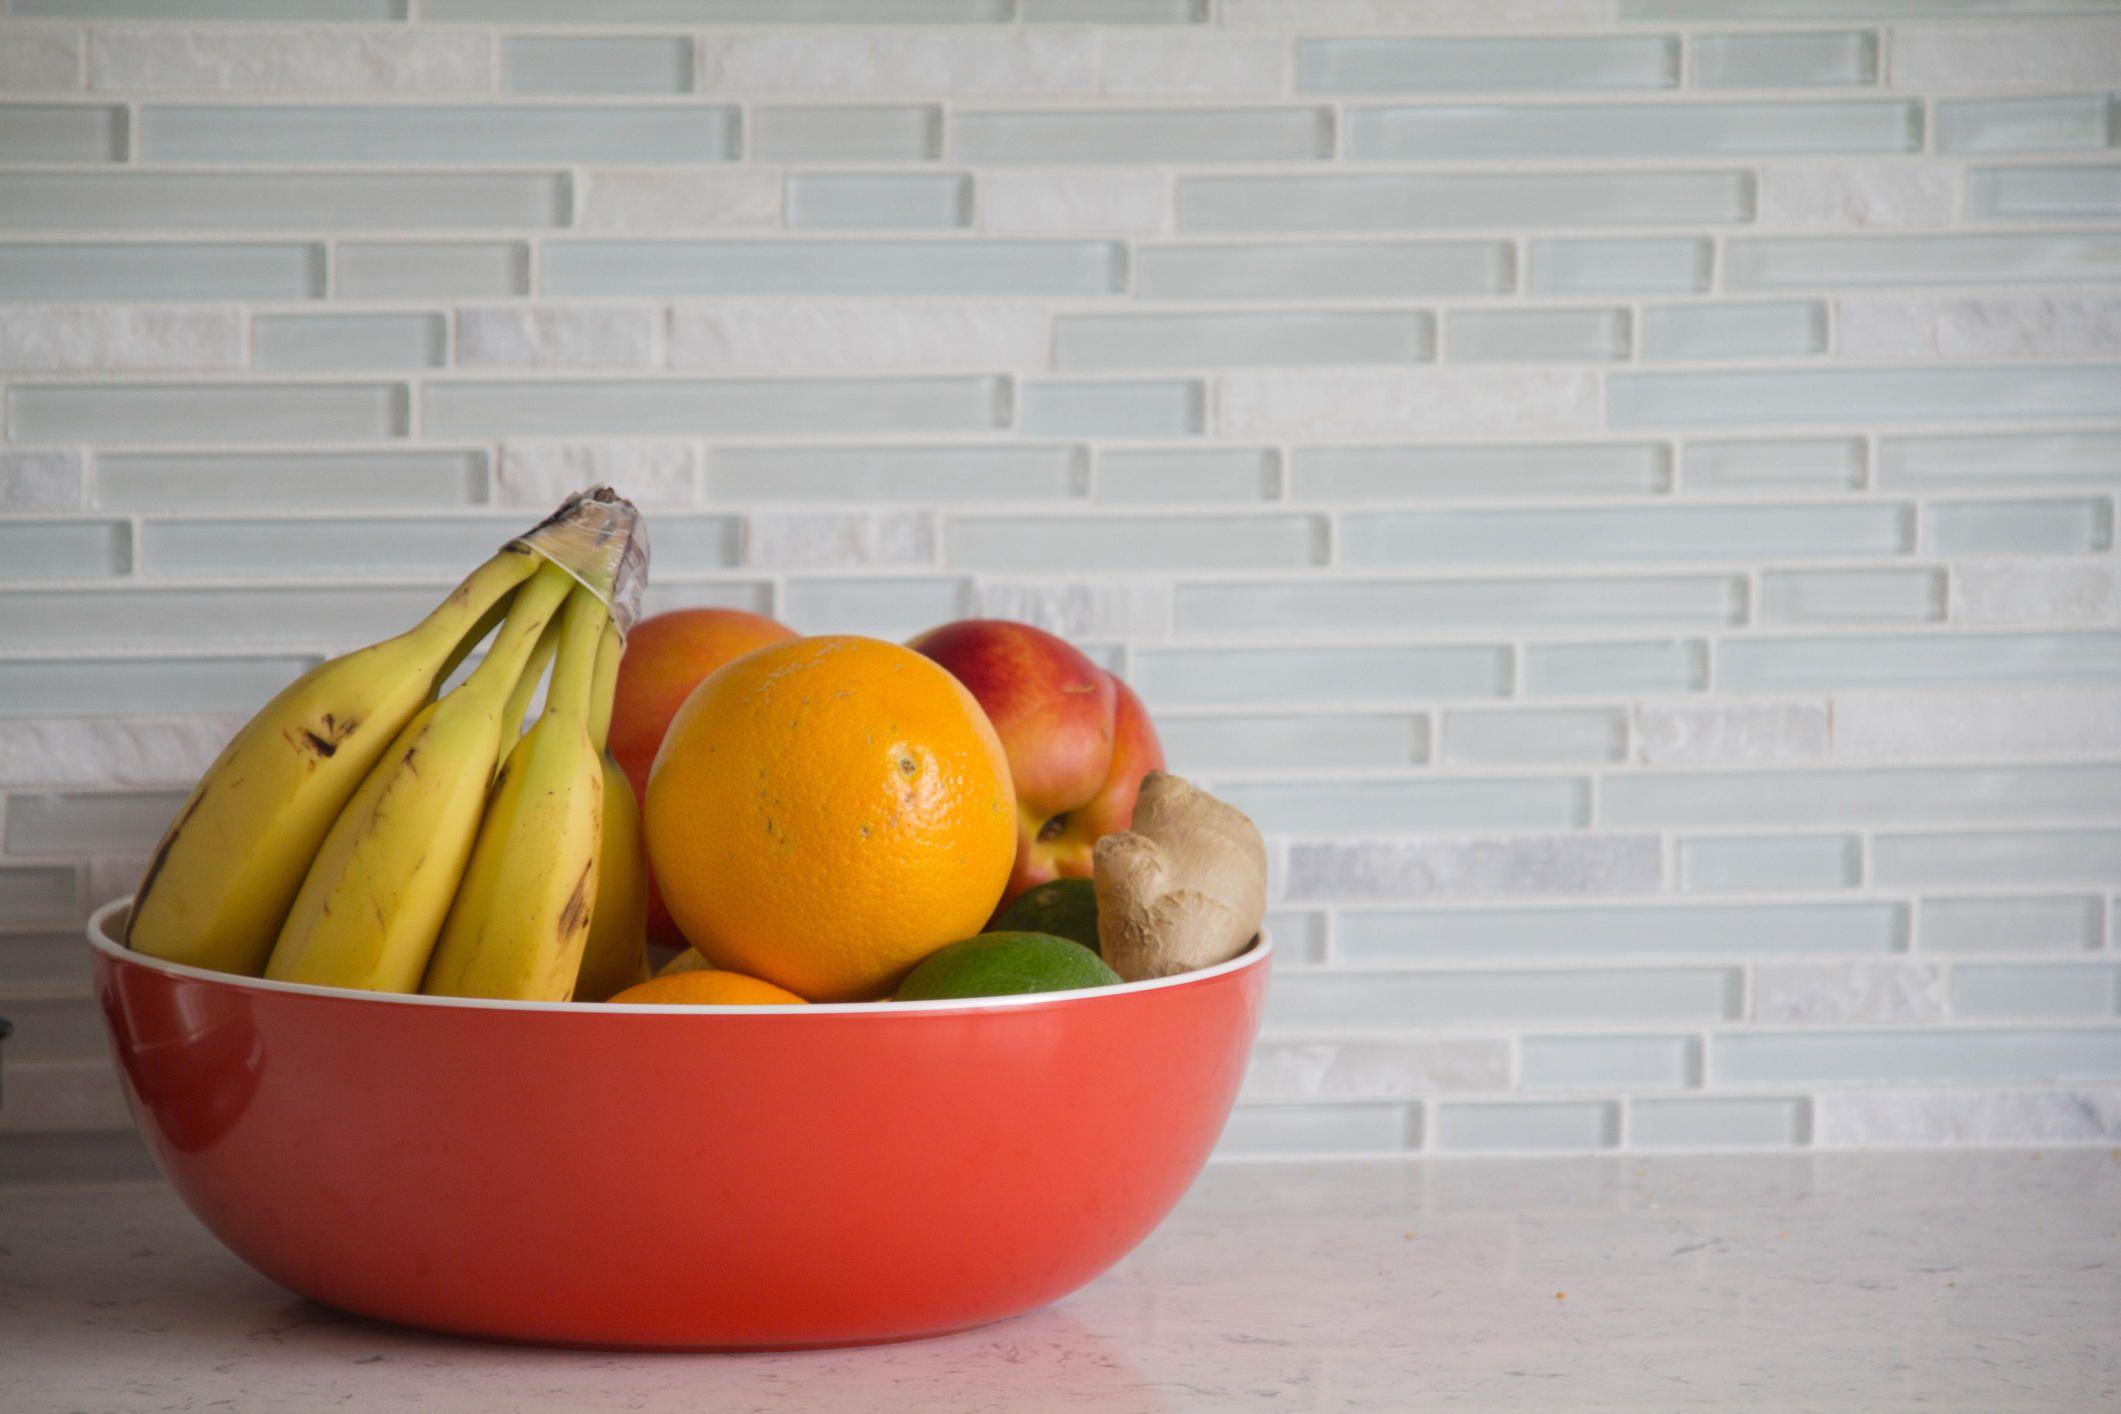 Fresh fruit in red bowl